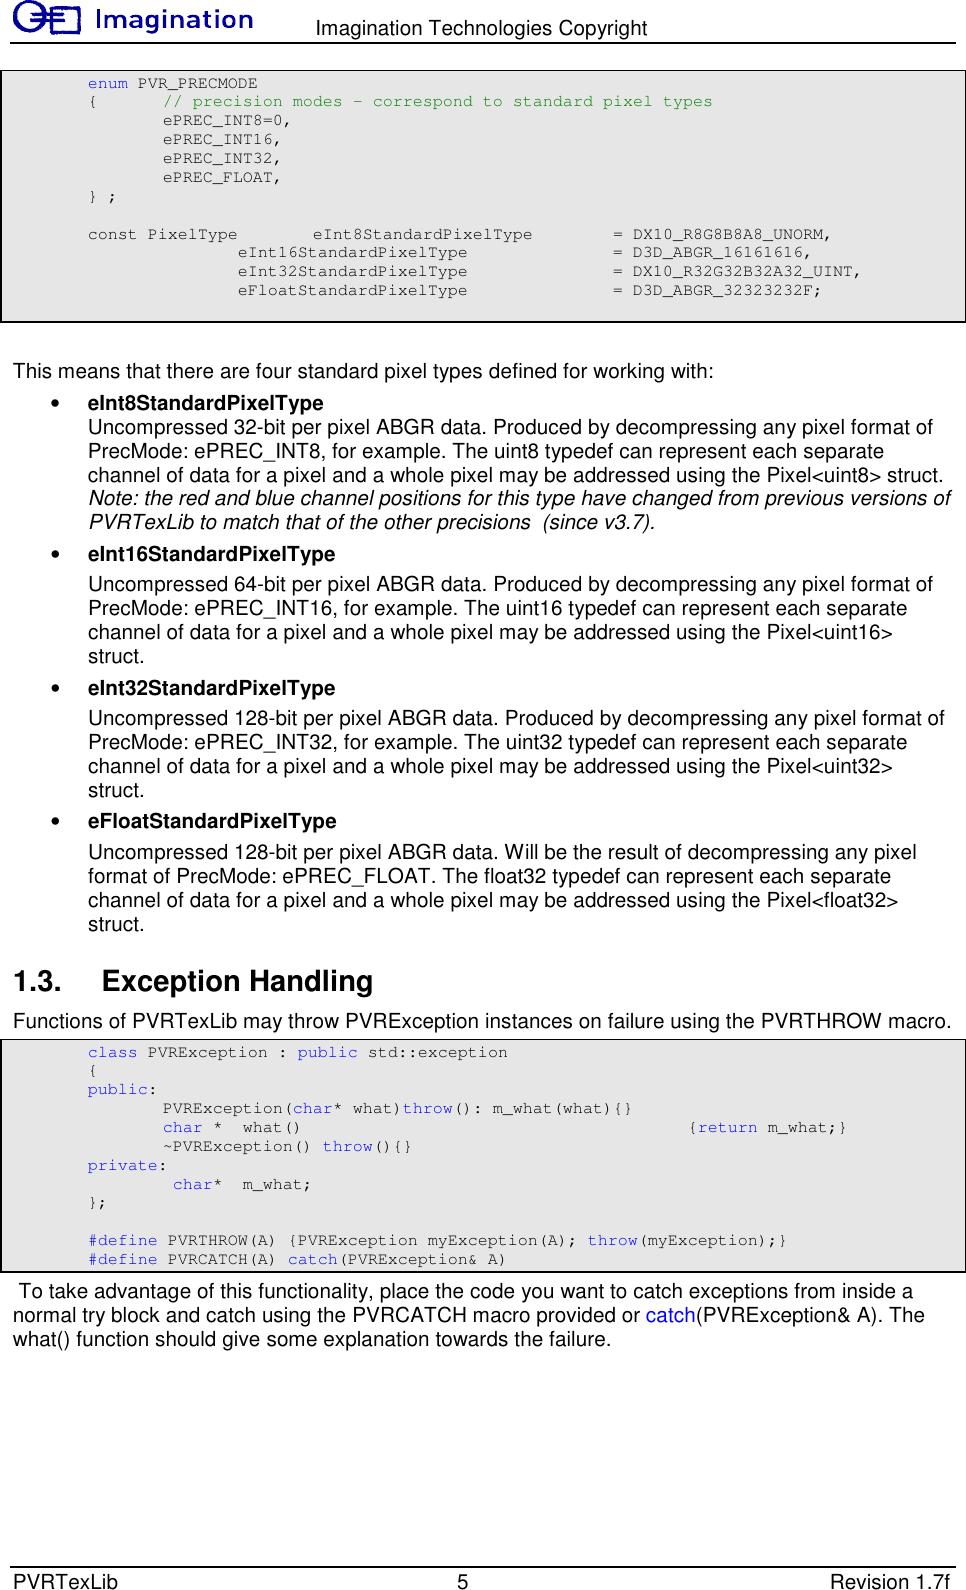 PVRTex Lib User Manual 1 7f External